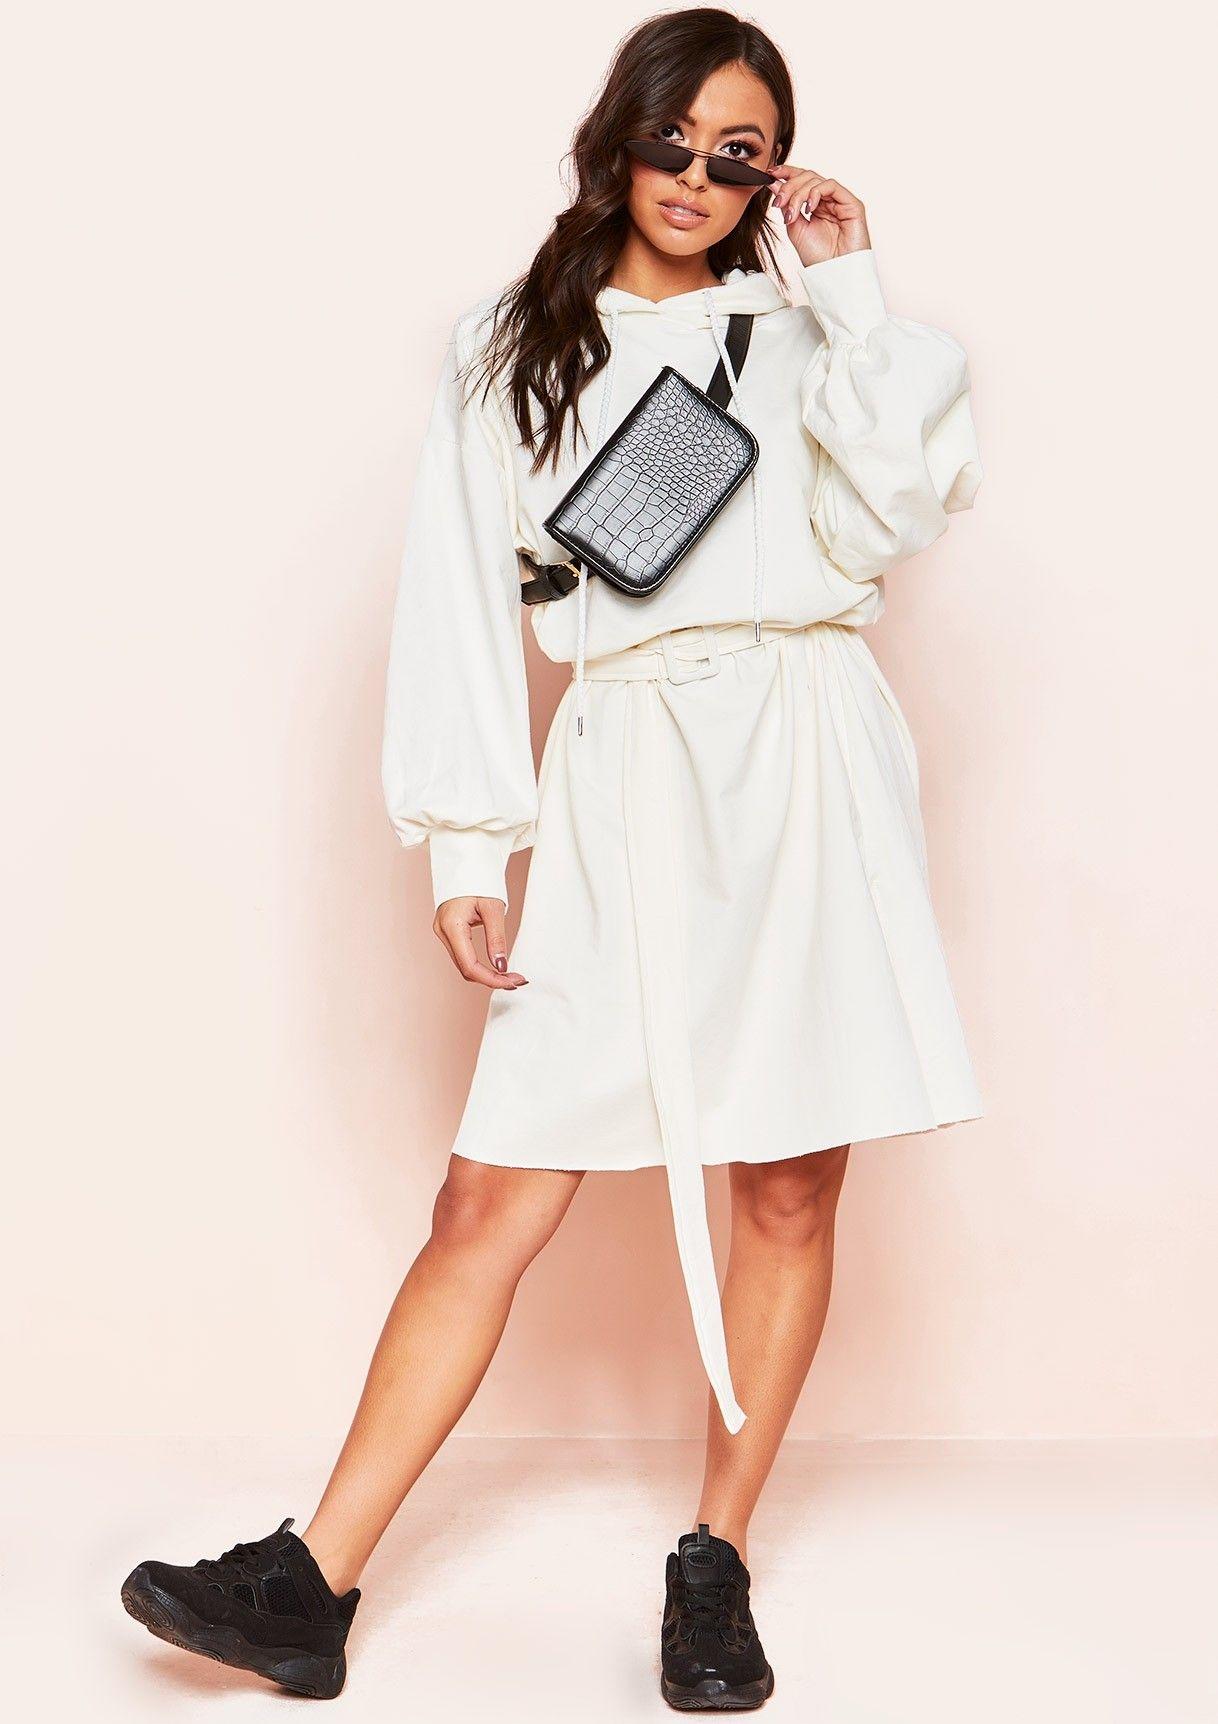 ccce342a3b8 Missyempire - Laila Cream Belted Hooded Jumper Dress